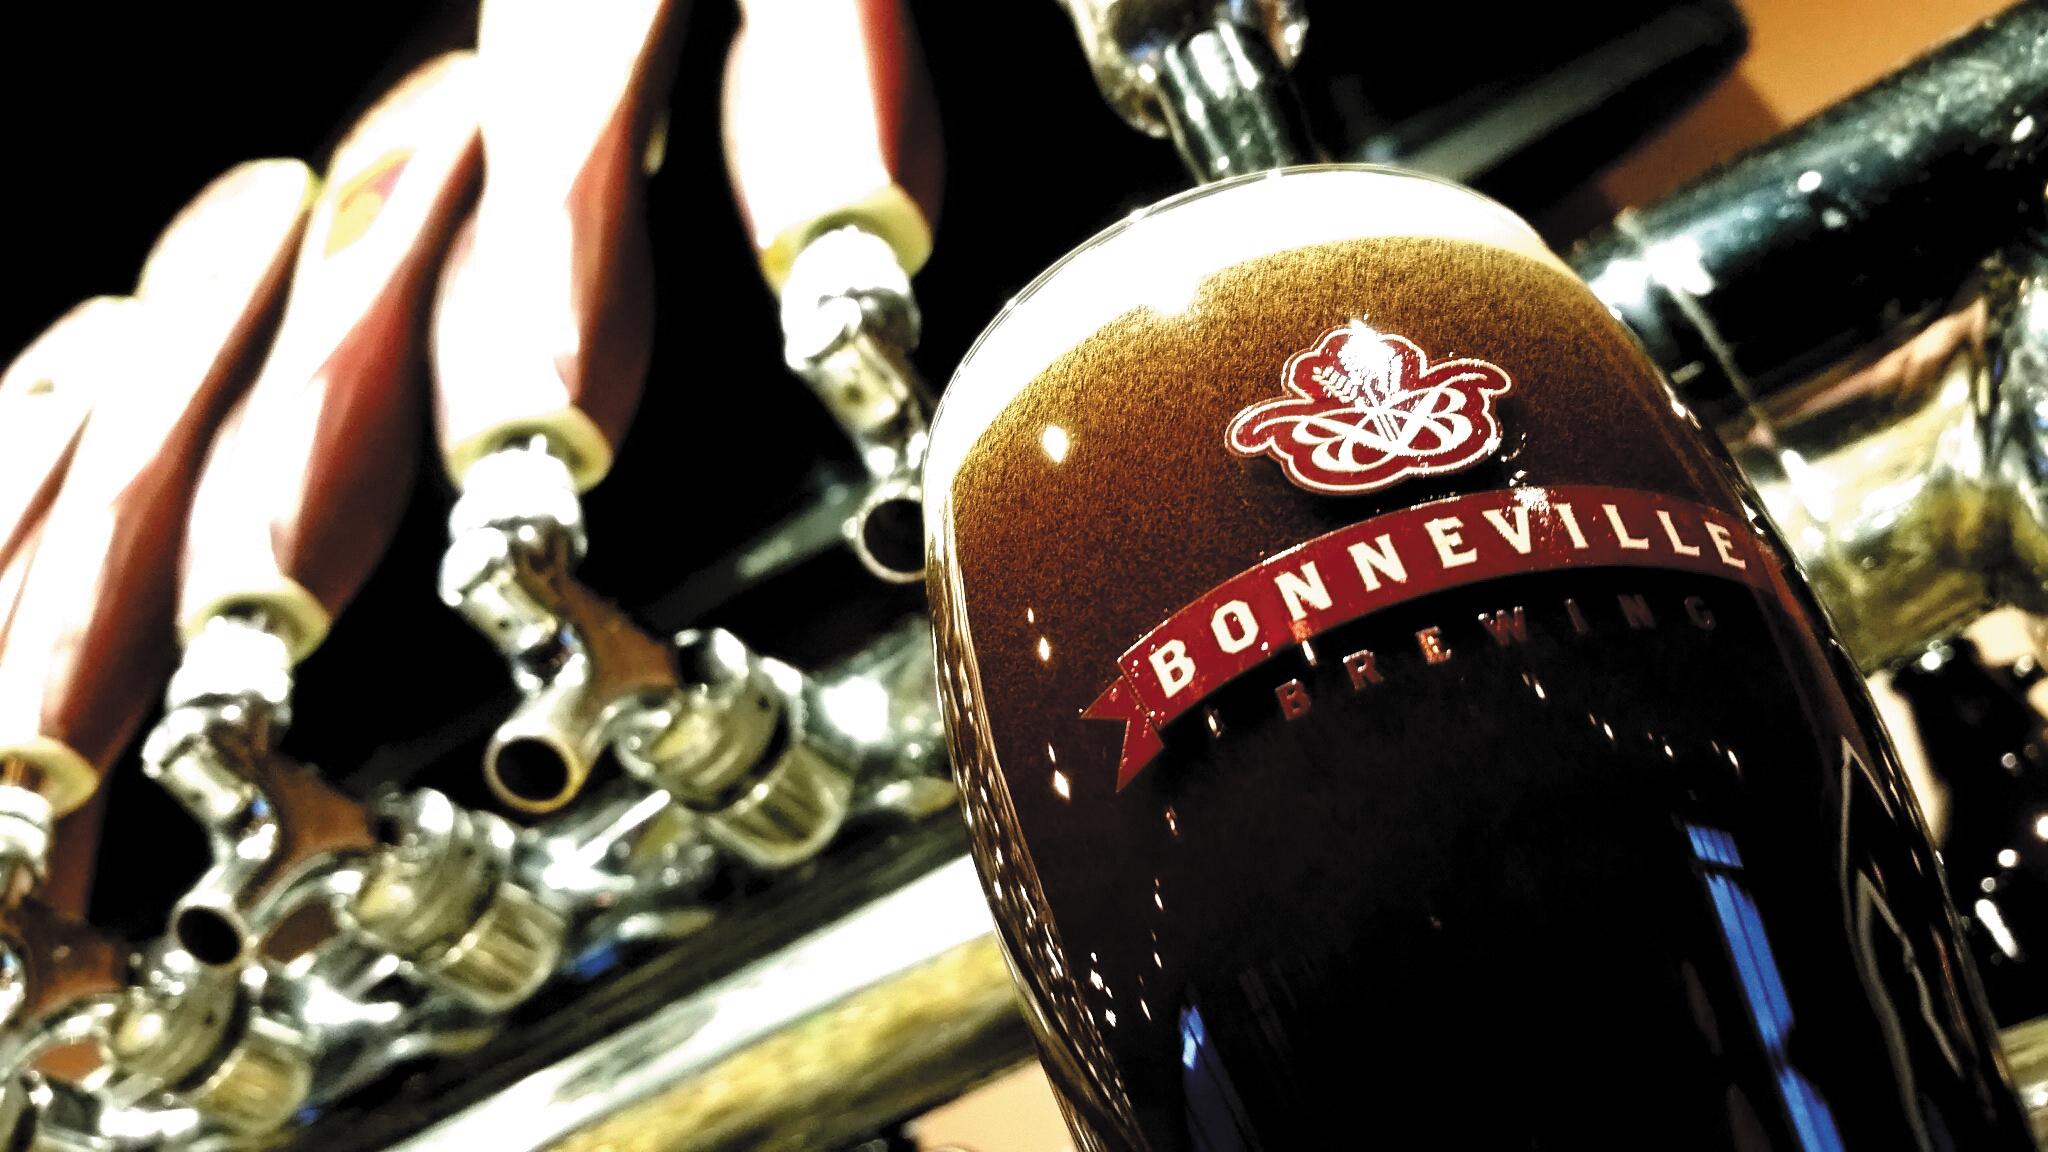 Sir Malcom's Stout | Bonneville Brewing